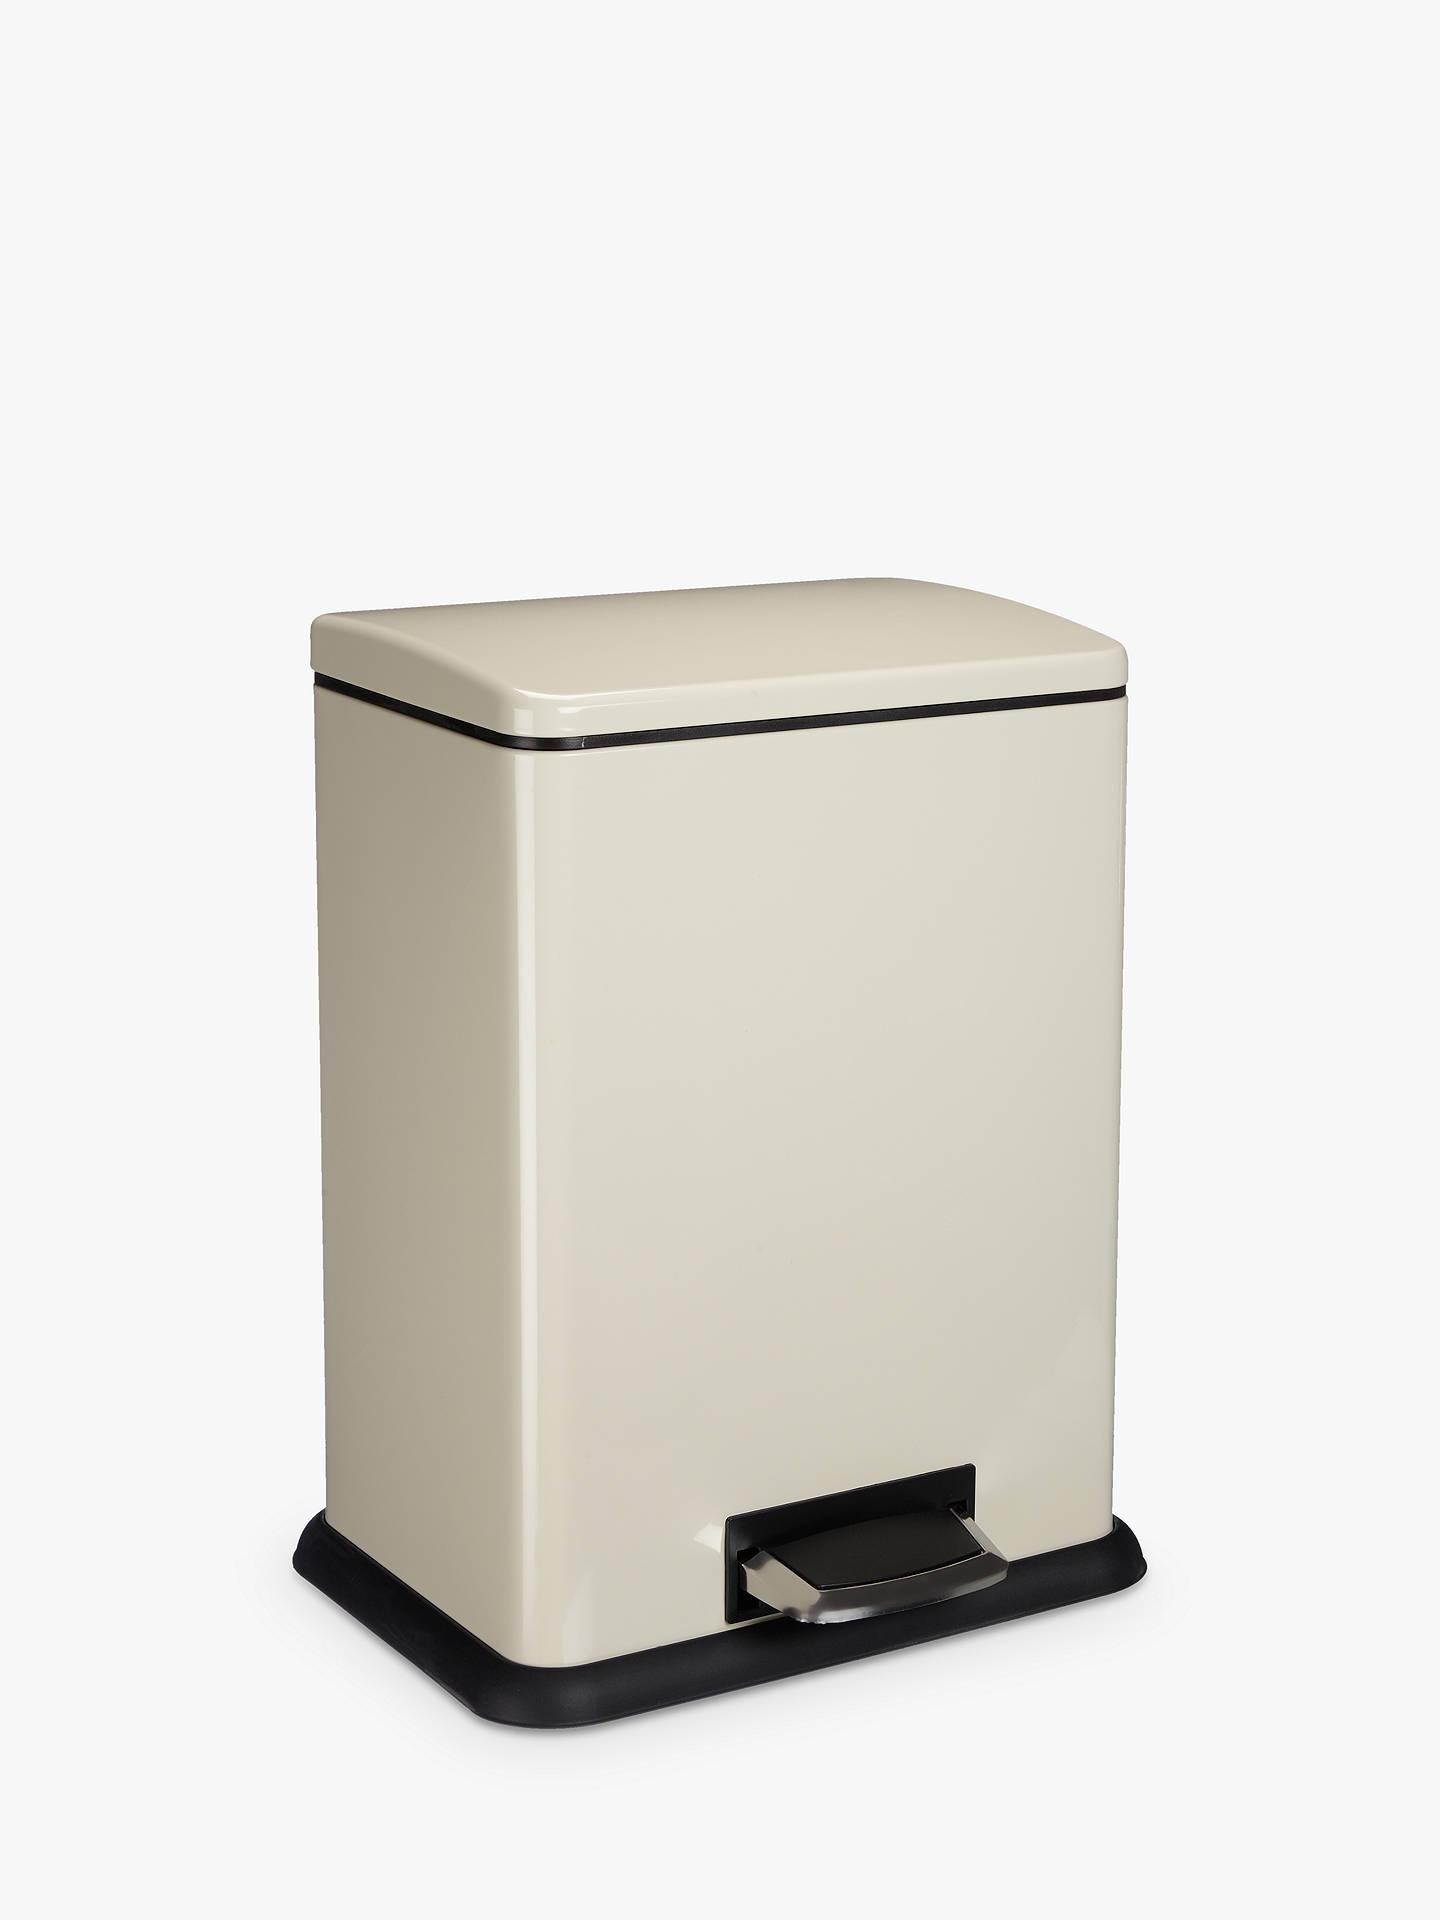 john lewis partners 2 section recycling bin cream 2 x. Black Bedroom Furniture Sets. Home Design Ideas